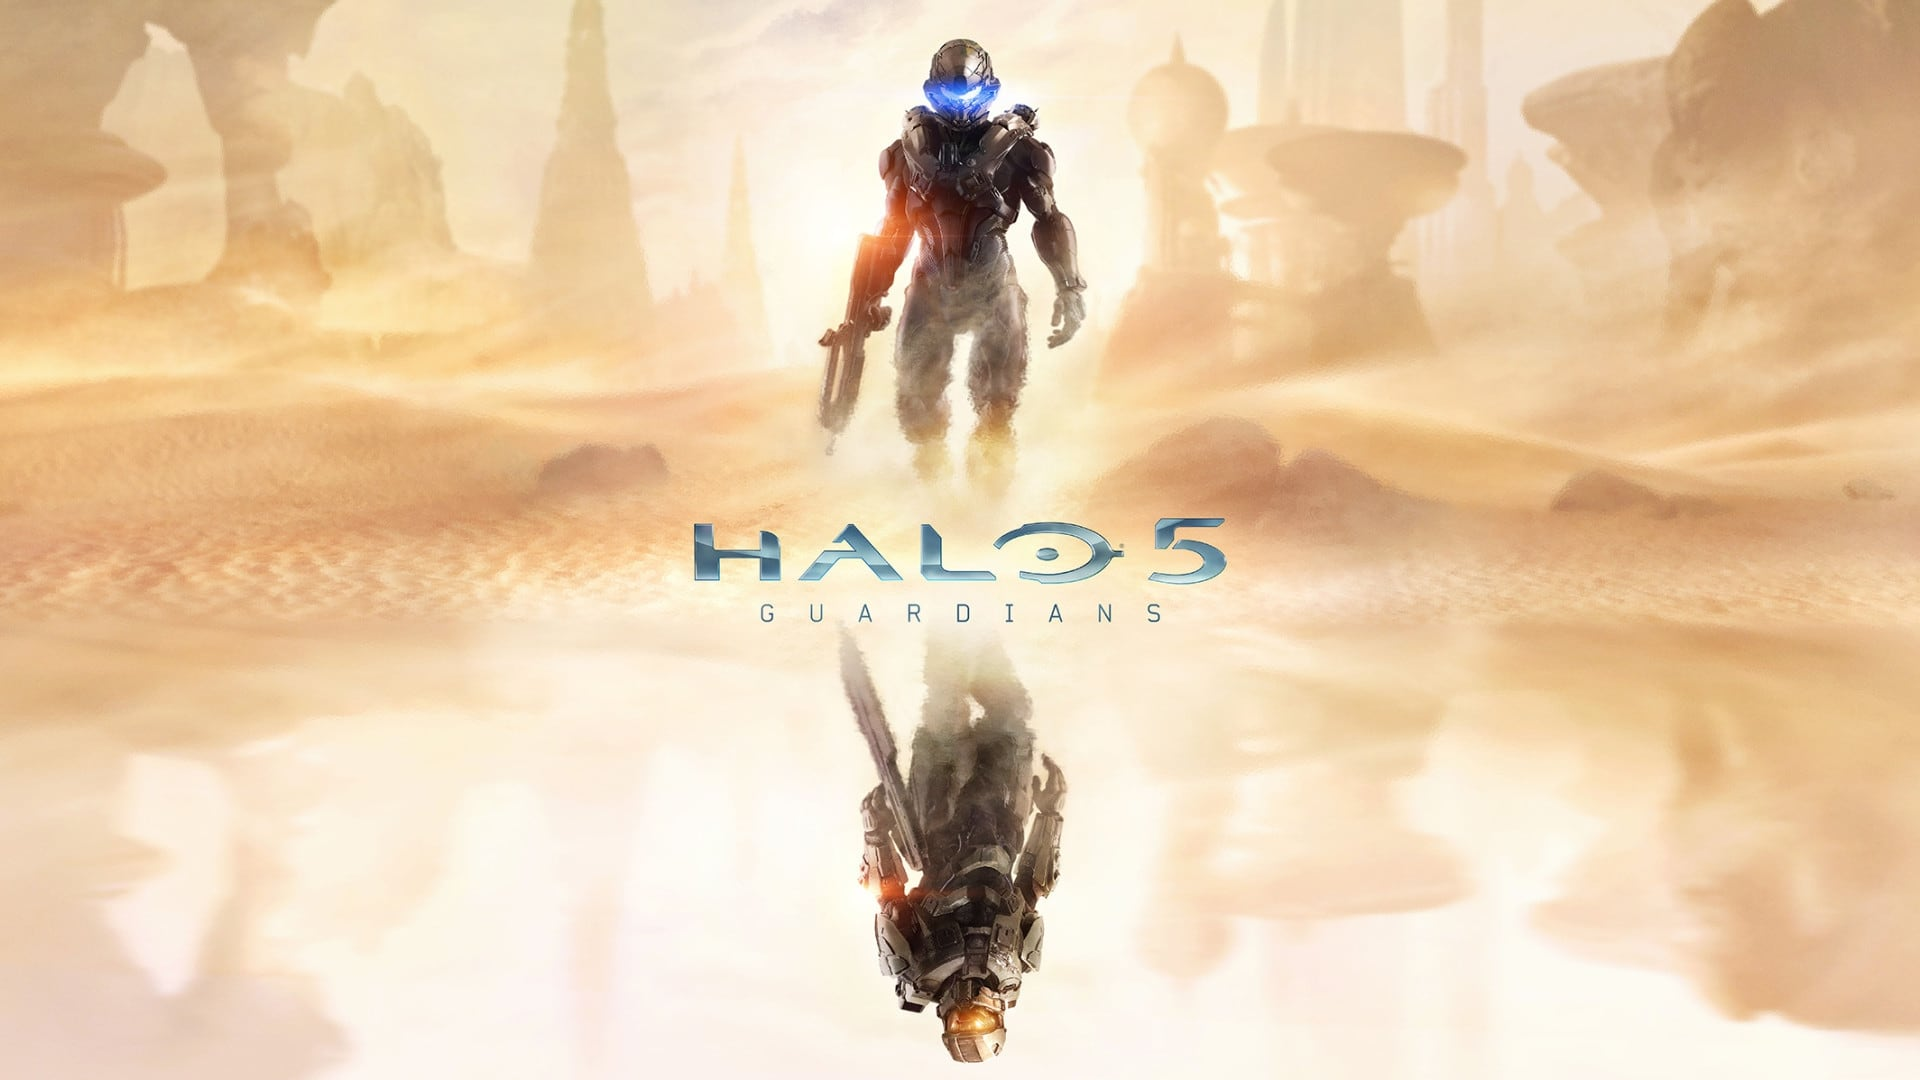 Halo 5: Guardians - Screenshot-Galerie : pressakey.com